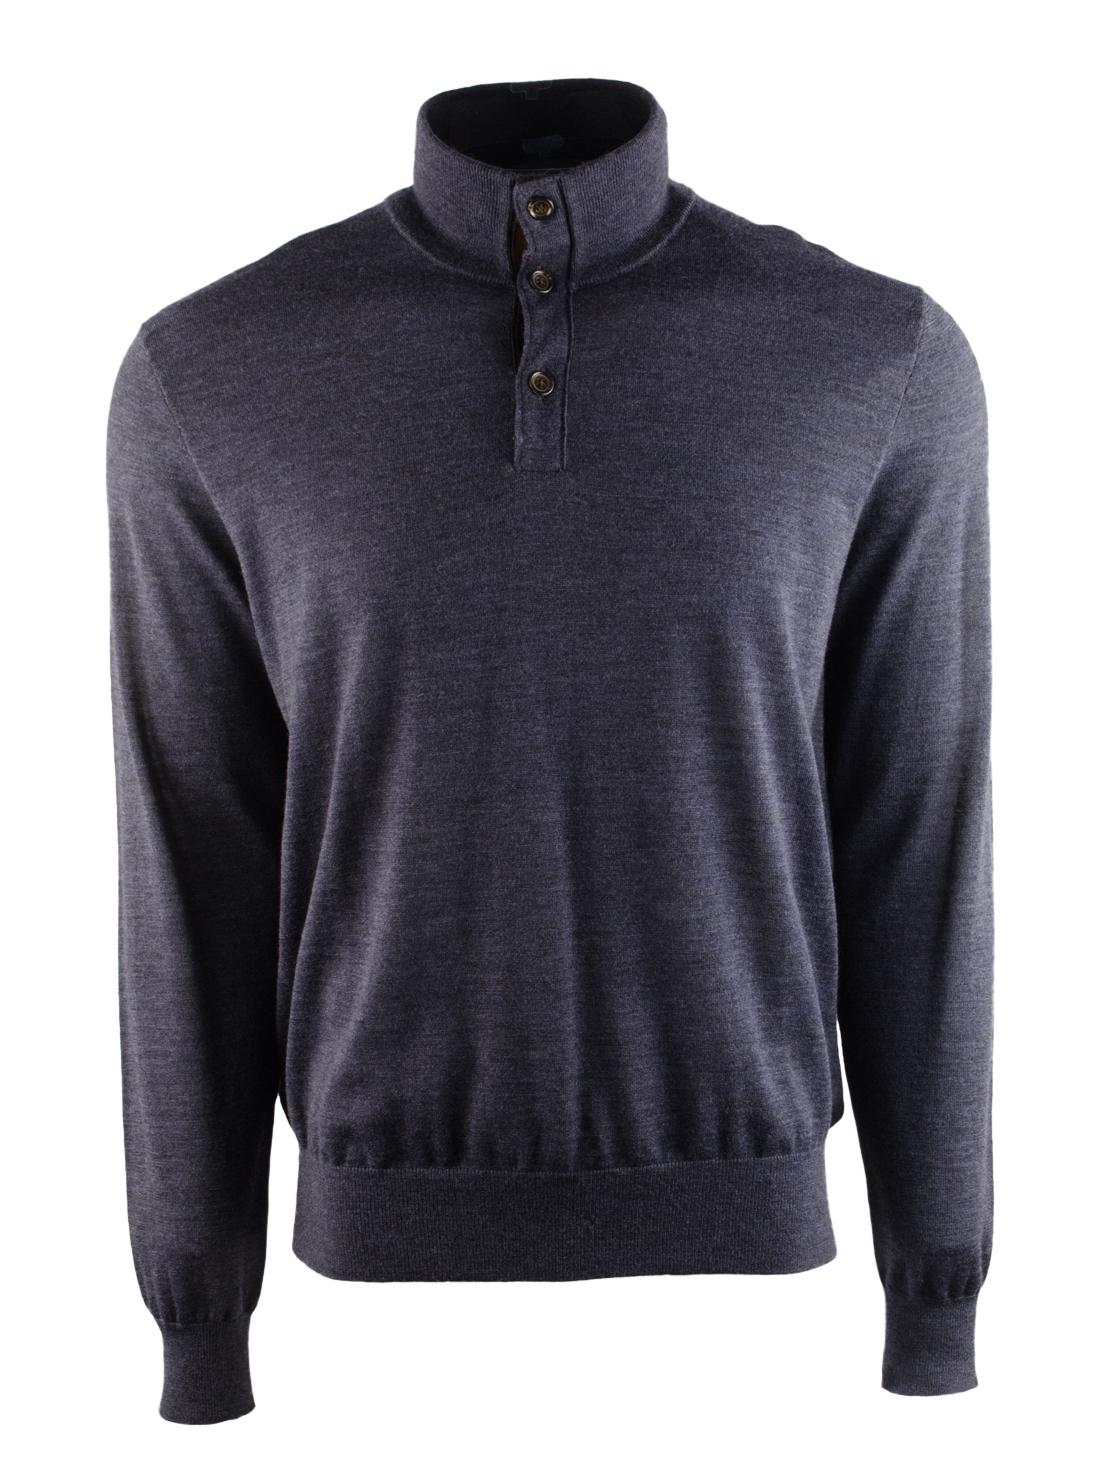 polo ralph lauren men 39 s merino wool pullover sweater ebay. Black Bedroom Furniture Sets. Home Design Ideas